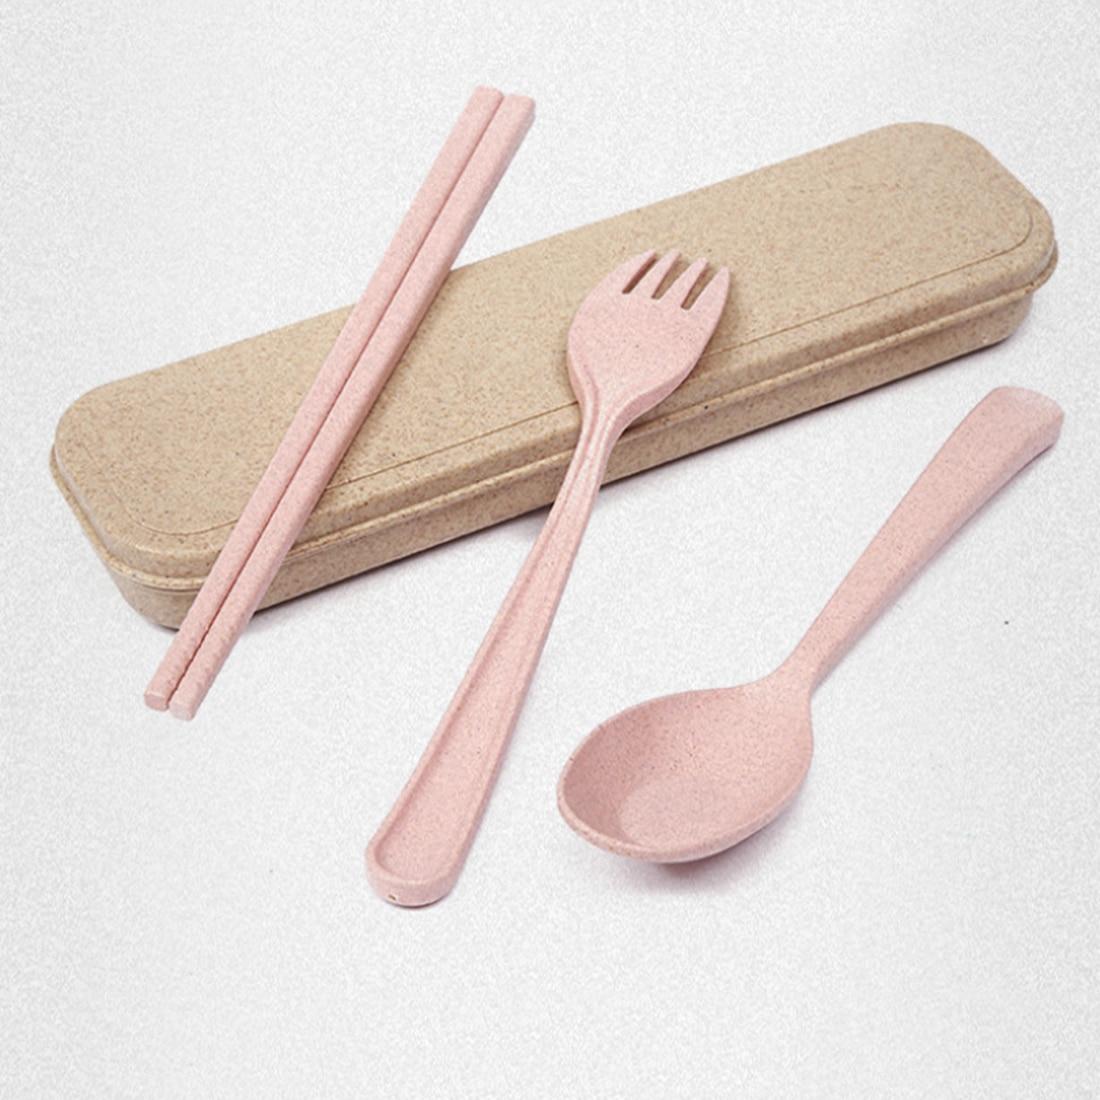 heat straw spoon chopst - 800×800